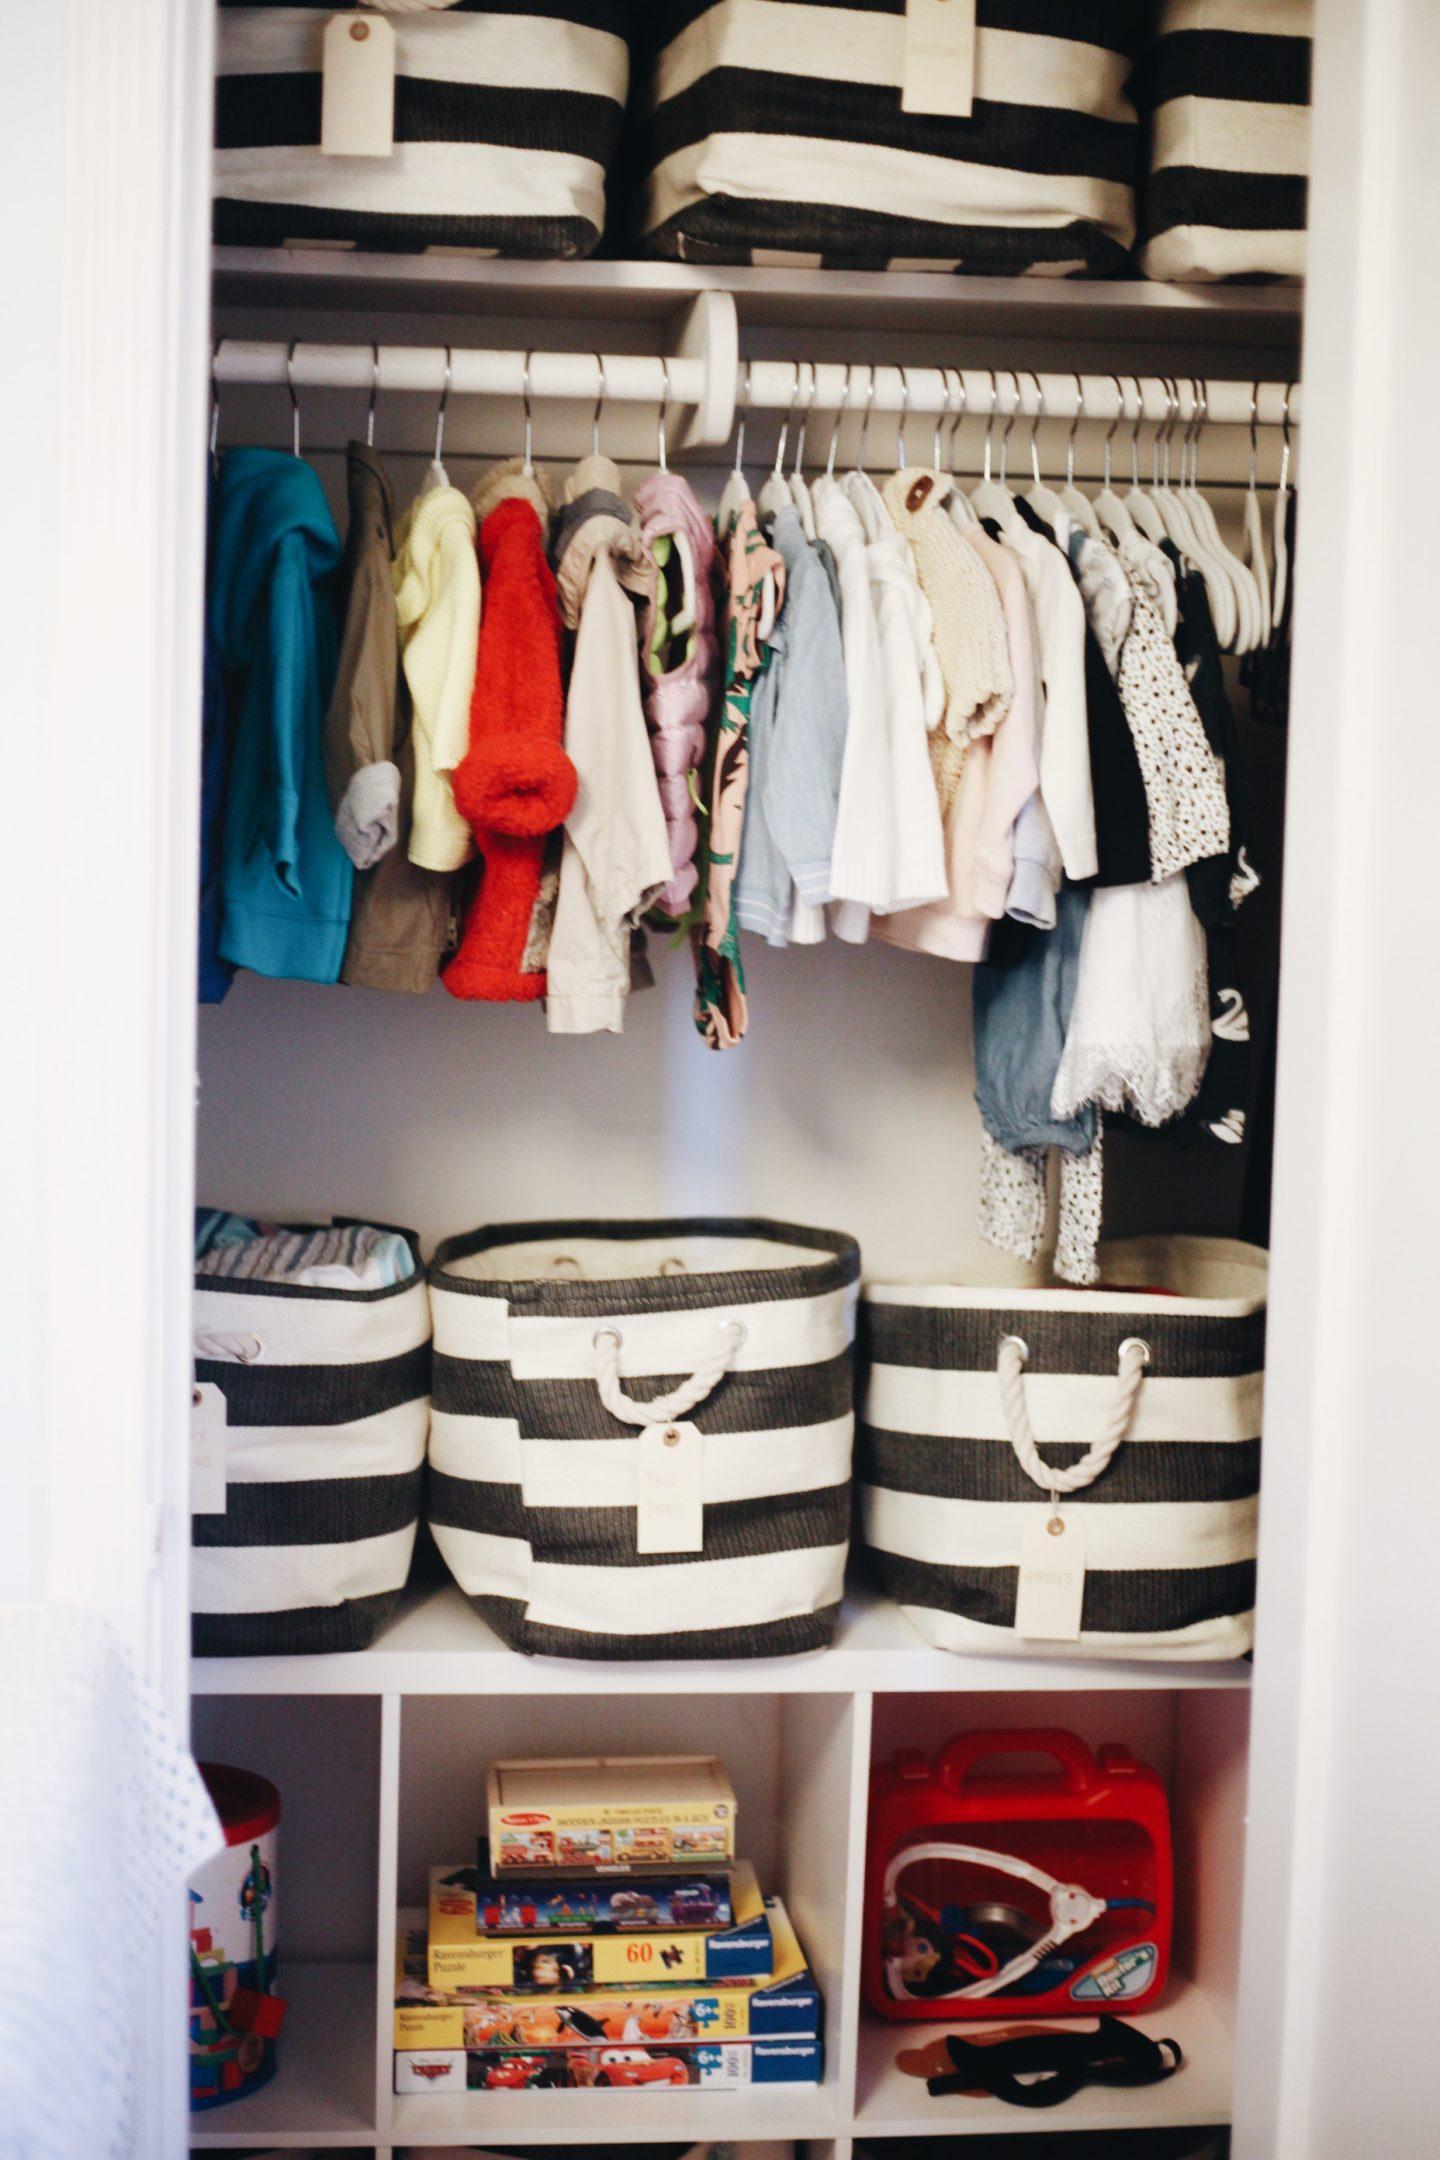 Shared Nursery Closet Makeover Organization   Container Store   Neat Method    SHARED NURSERY CLOSET MAKEOVER ...